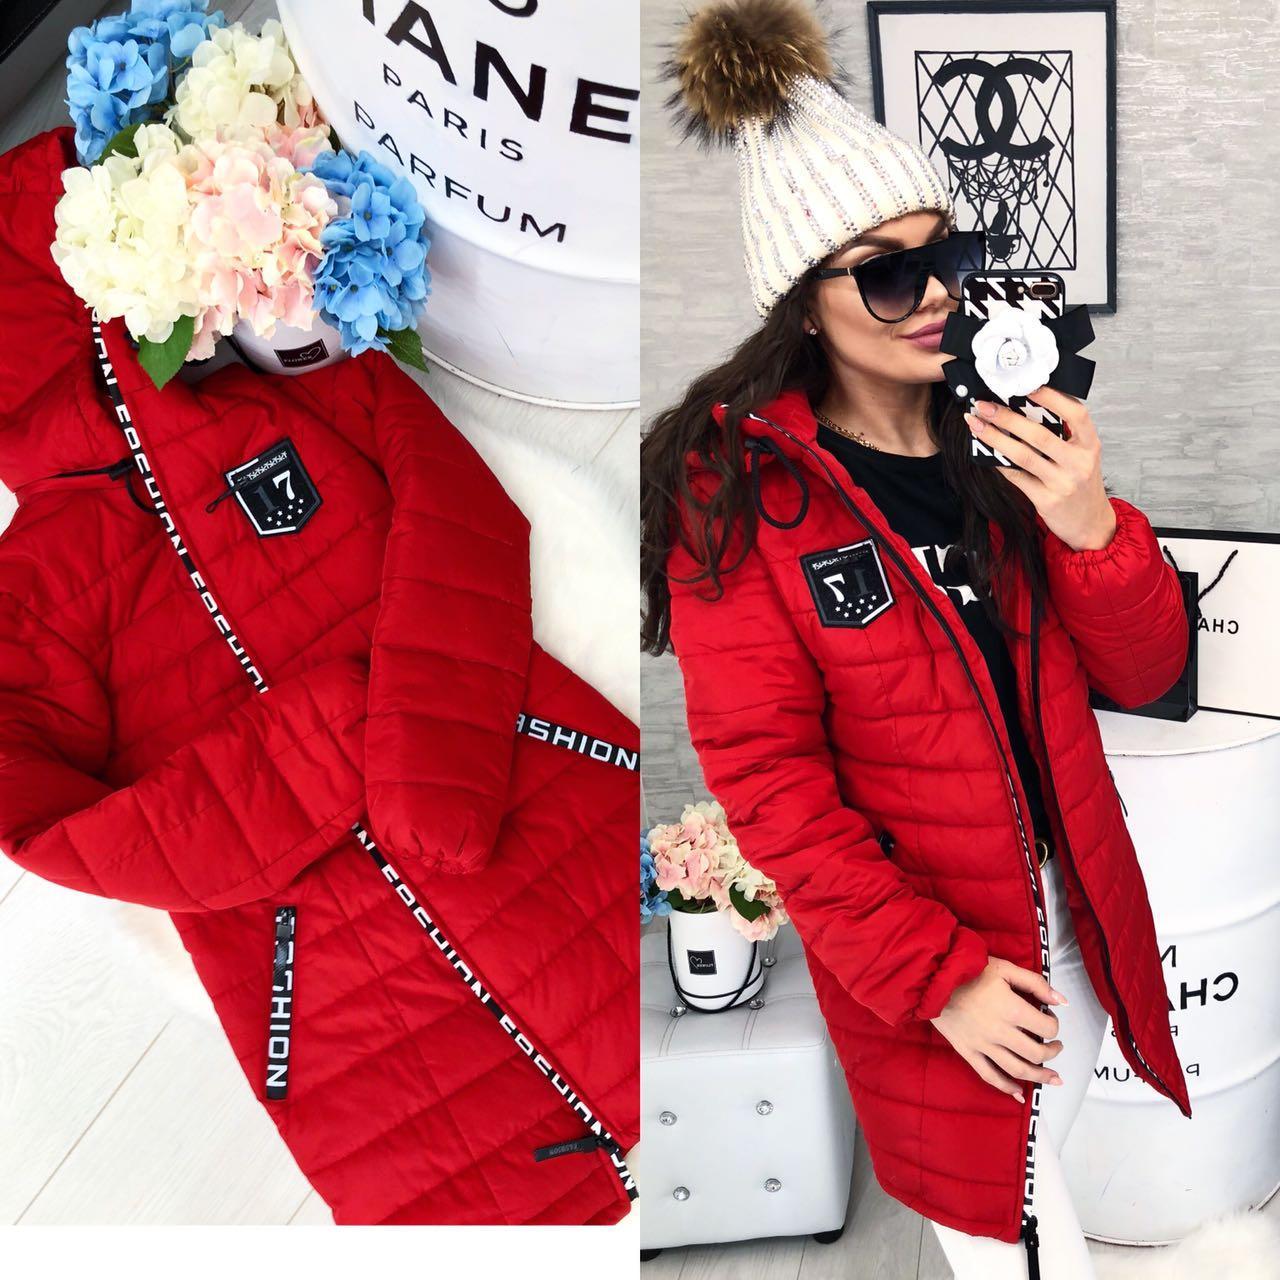 b9ef4080bff1 Куртка зимняя приталенная арт. 212/2 красная